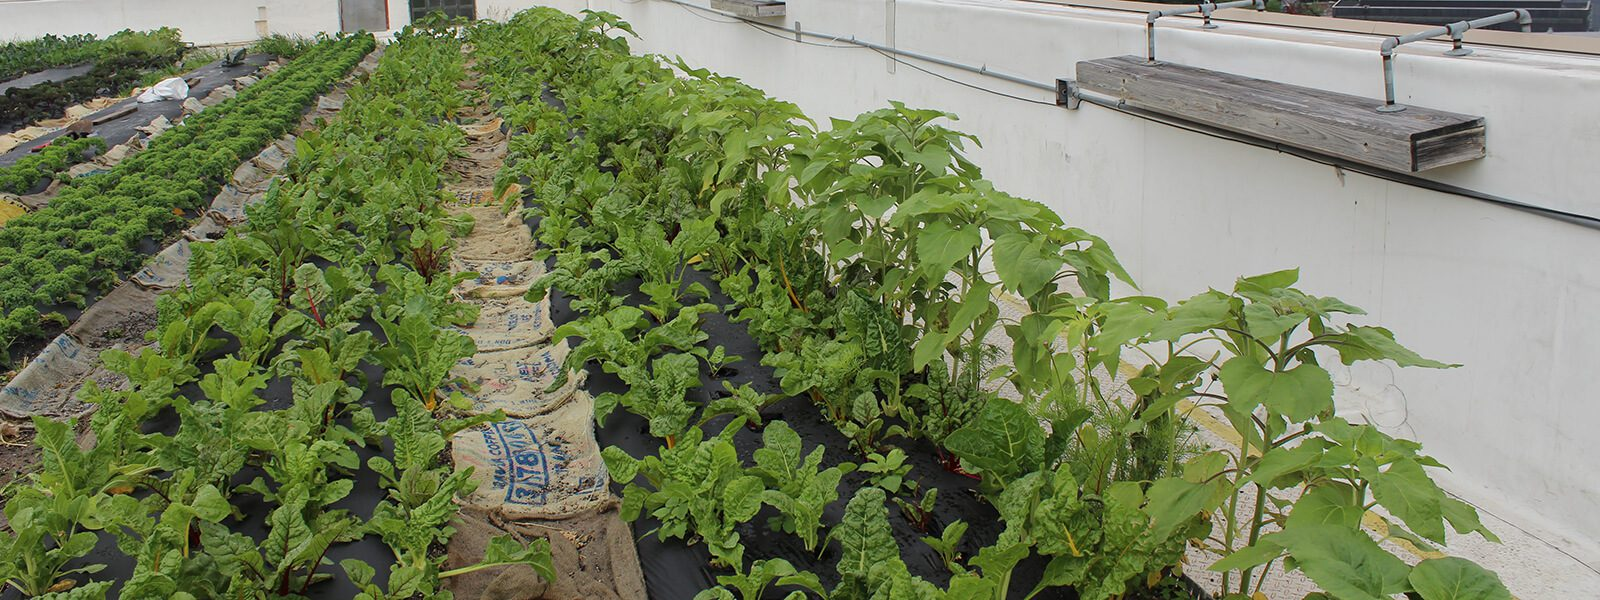 Plantings at Brooklyn Grange Rooftop Farm.